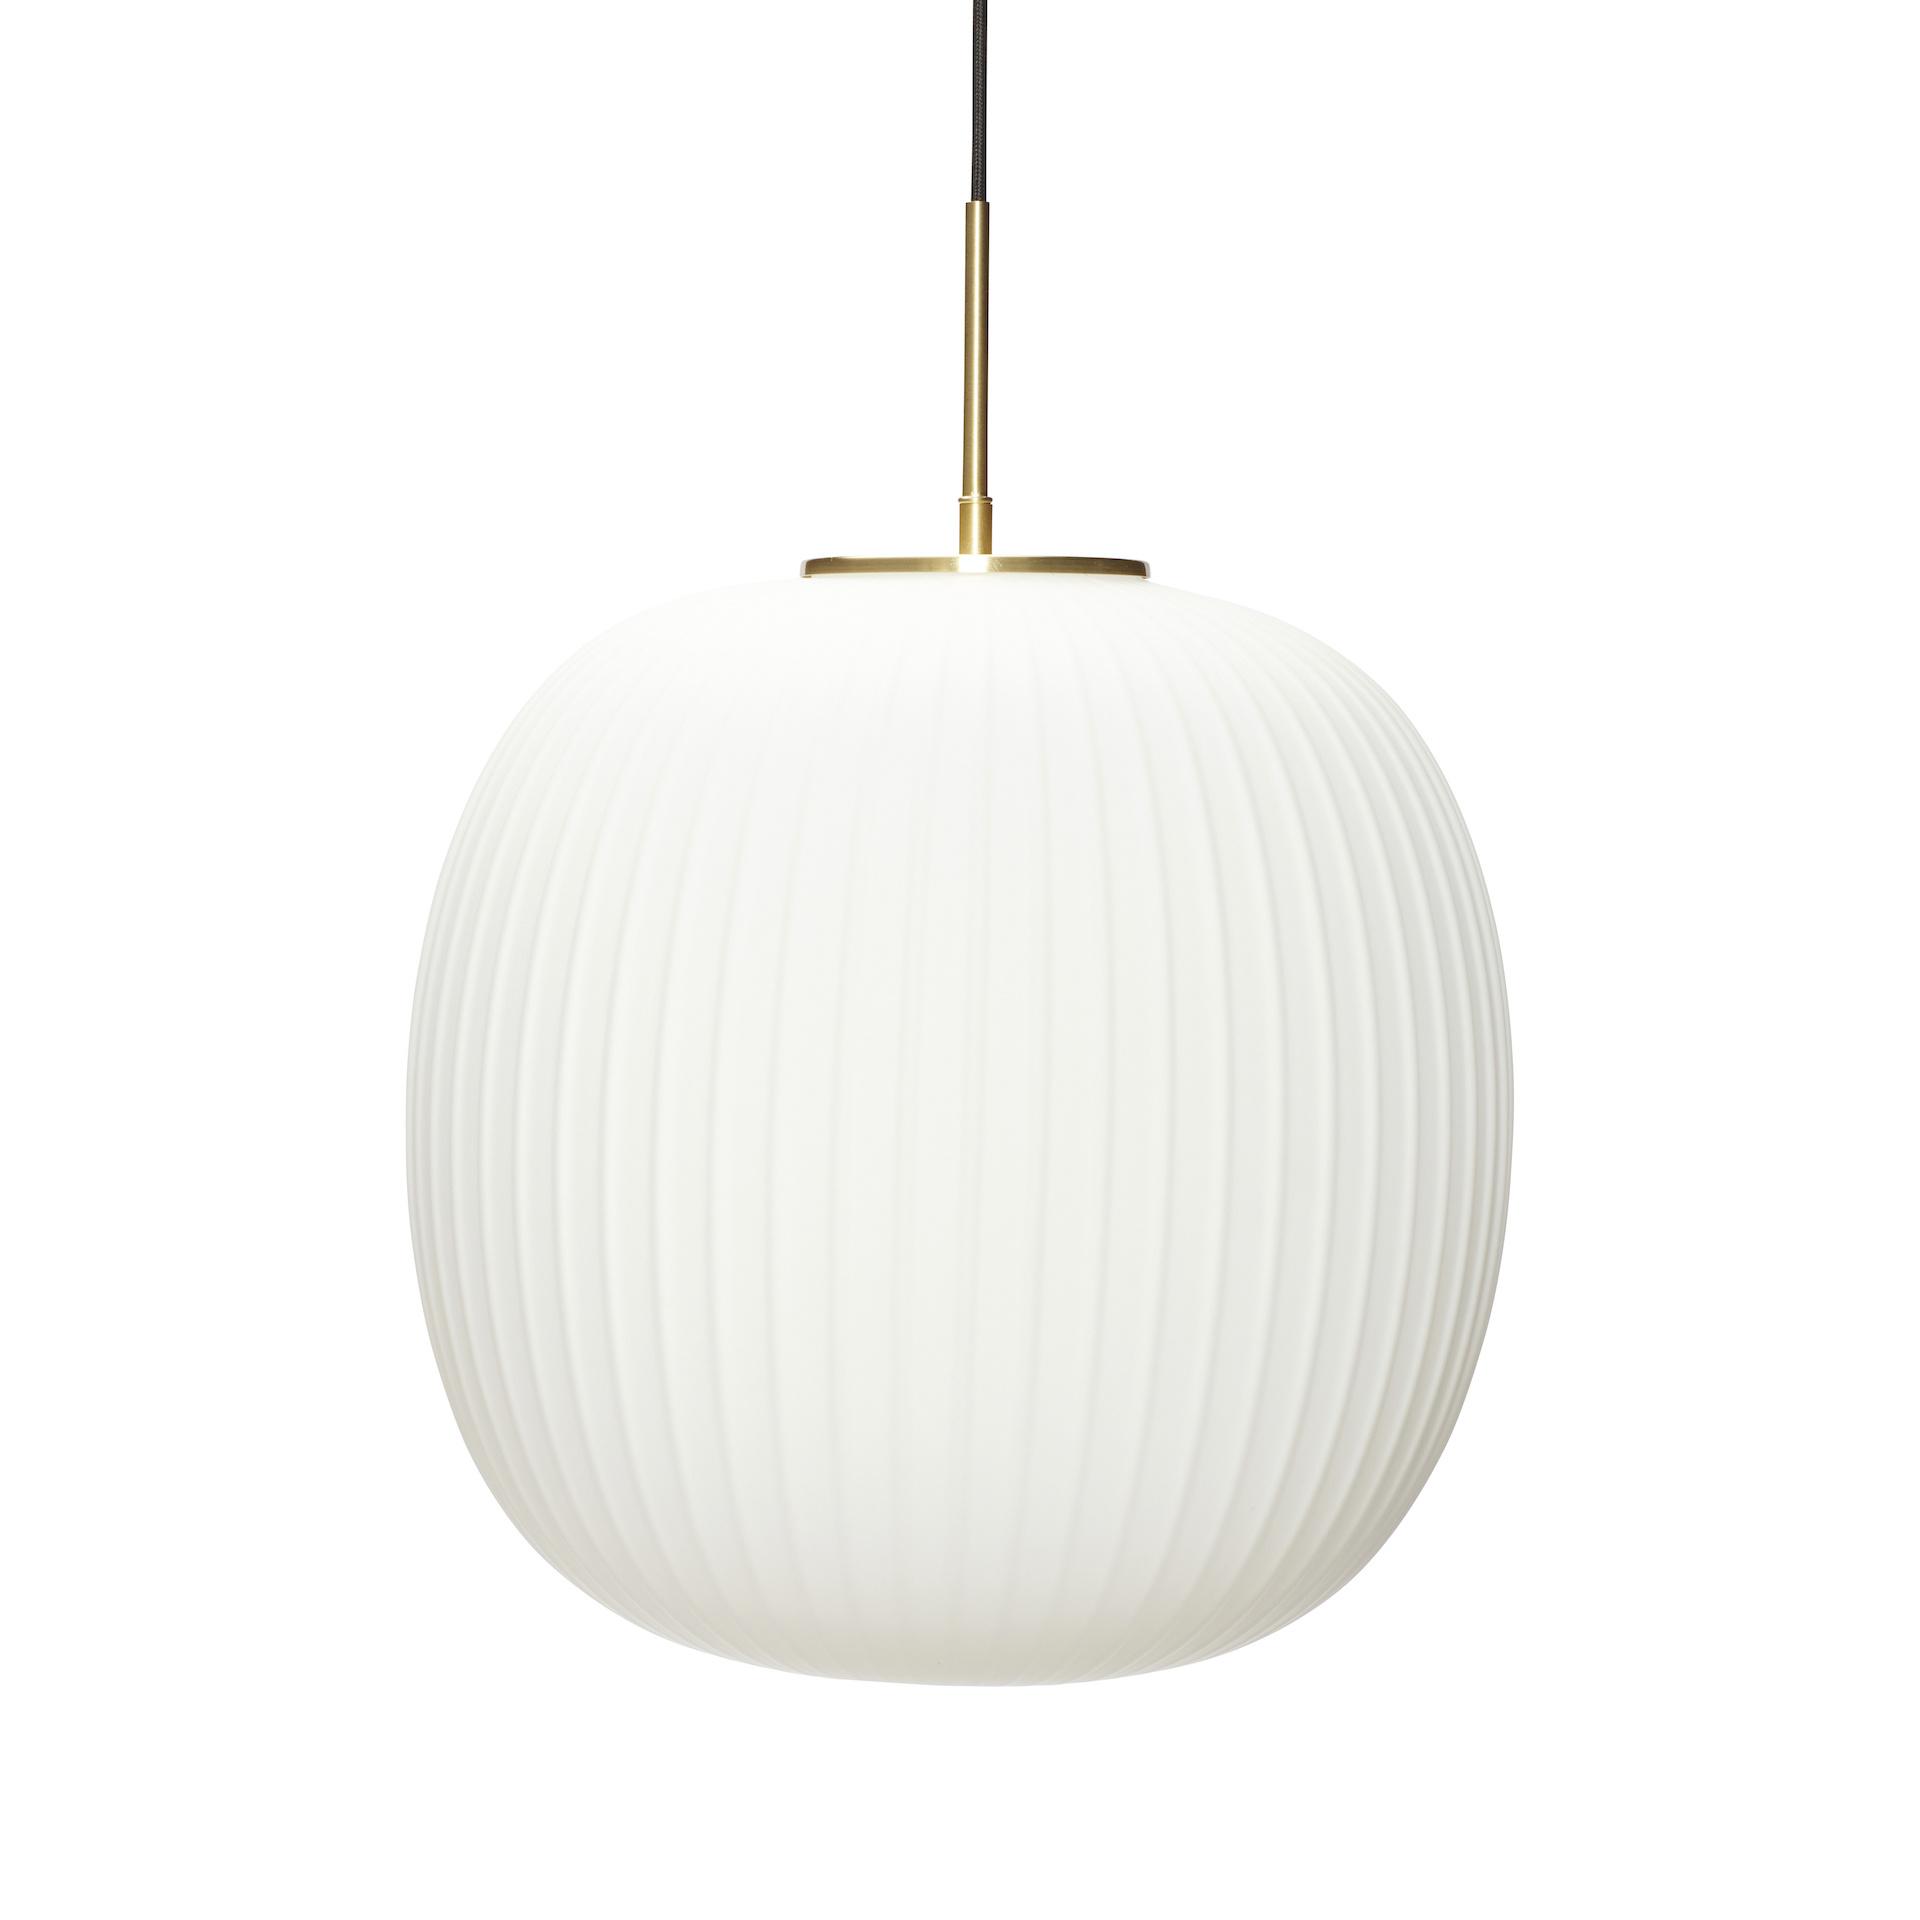 Hubsch Hanglamp glas wit/messing ø 42 cm-991321-5712772113110